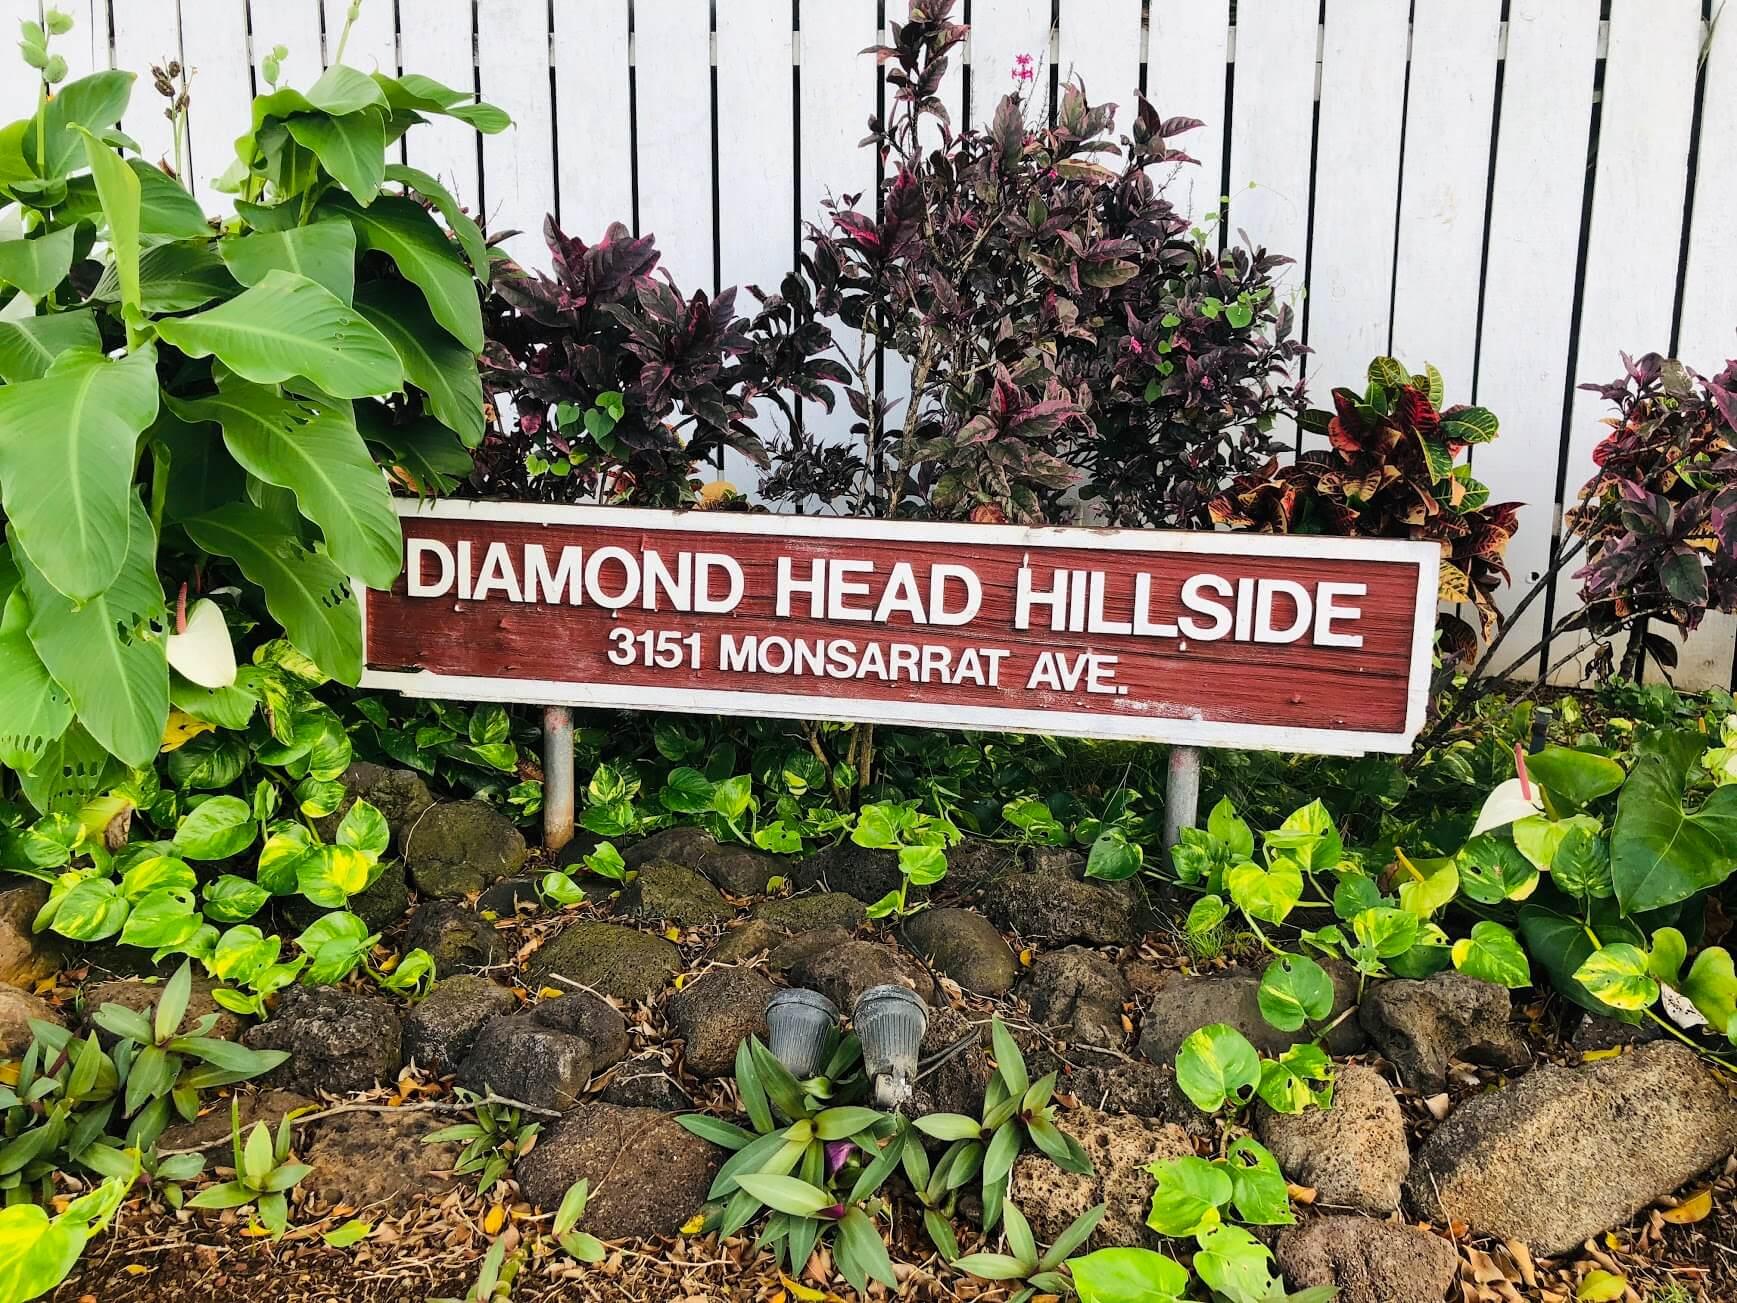 Diamond Head Hillsideの看板